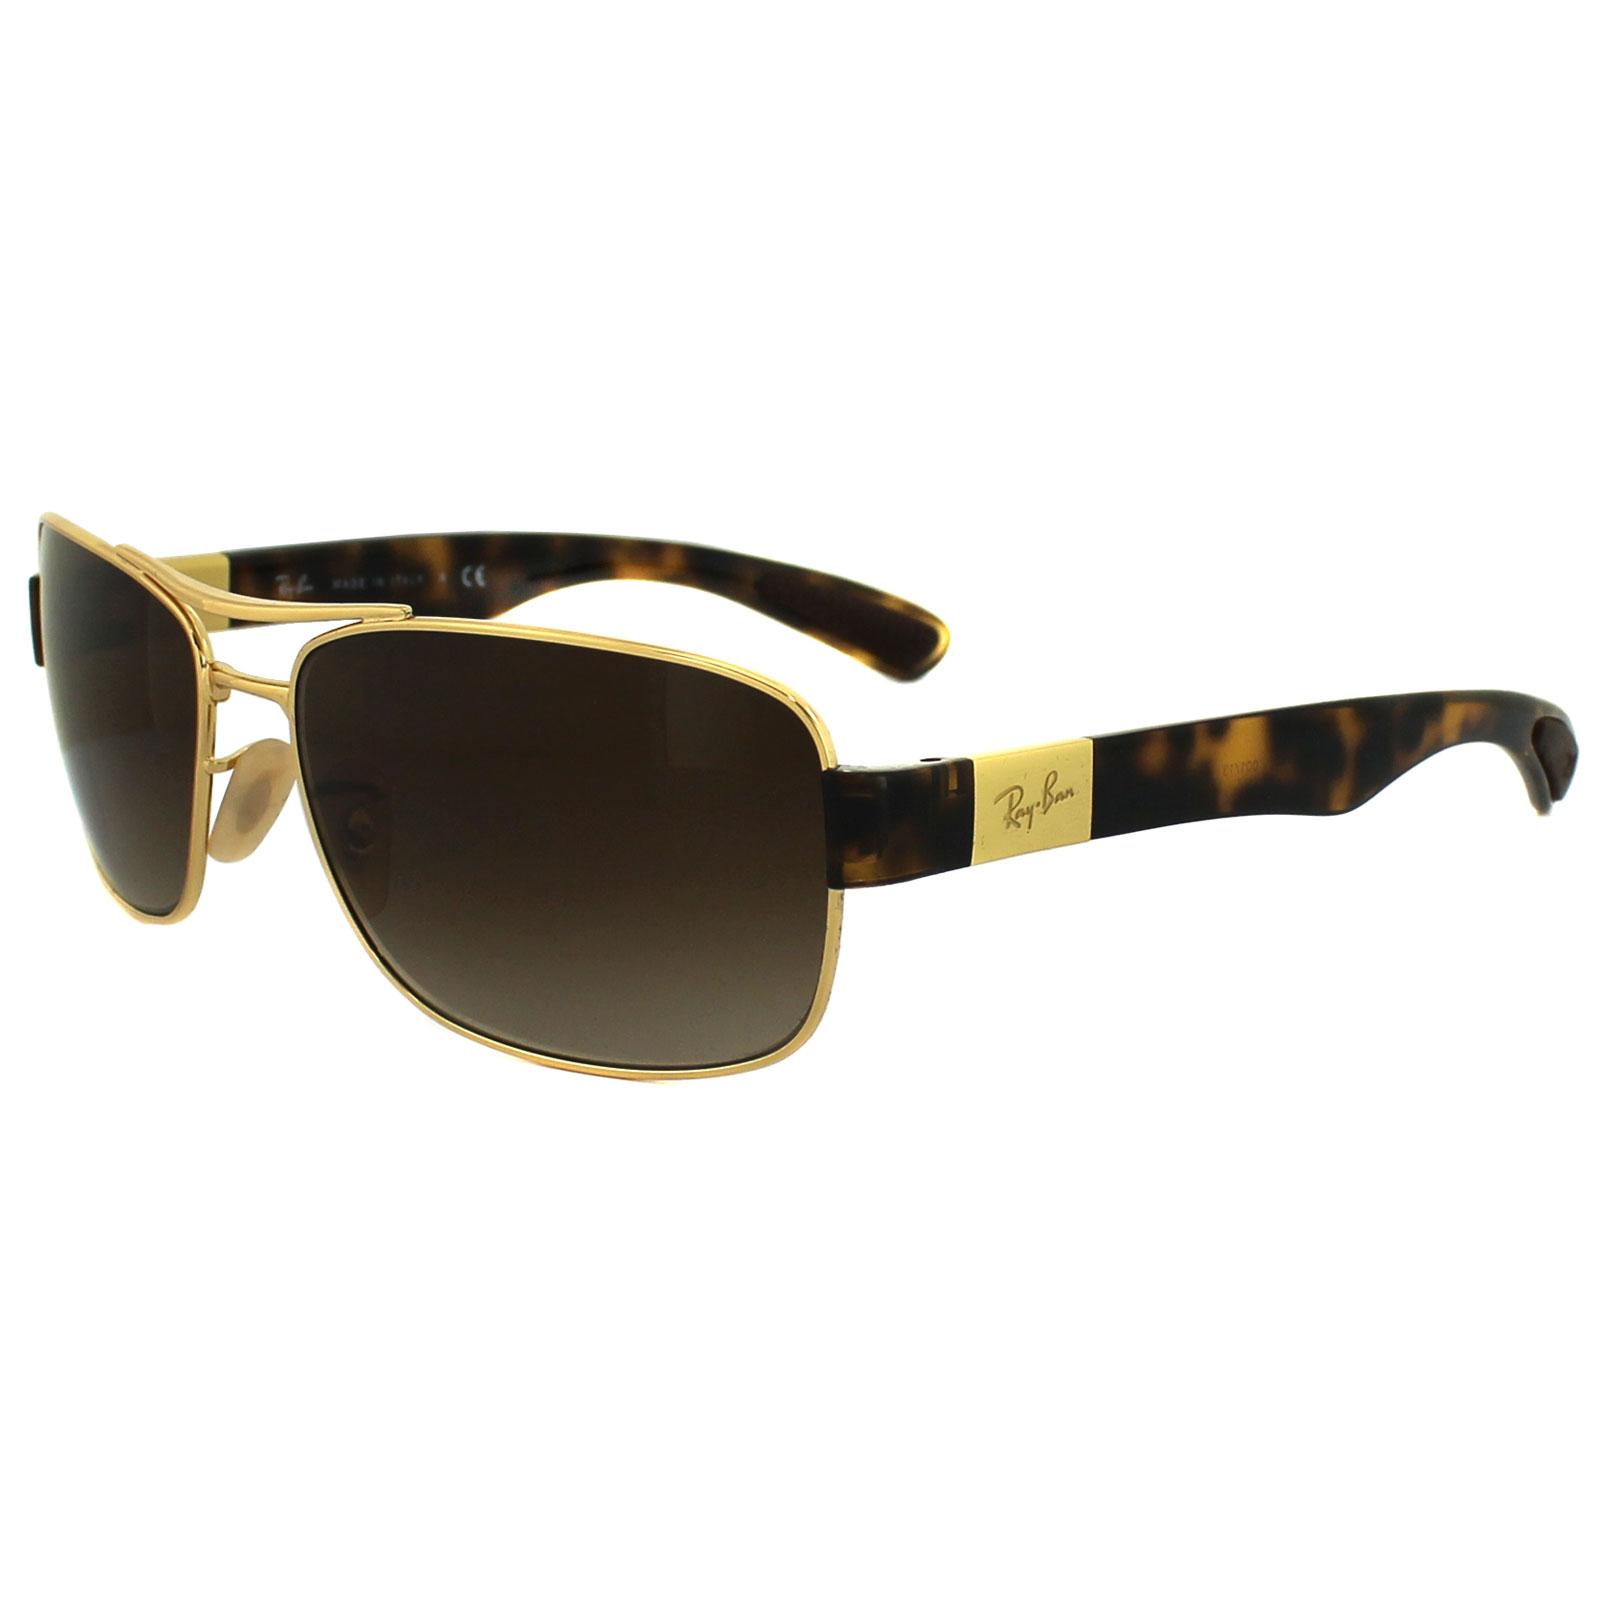 ray ban sunglasses quicker  ray ban sunglasses 3522 001/13 gold brown gradient